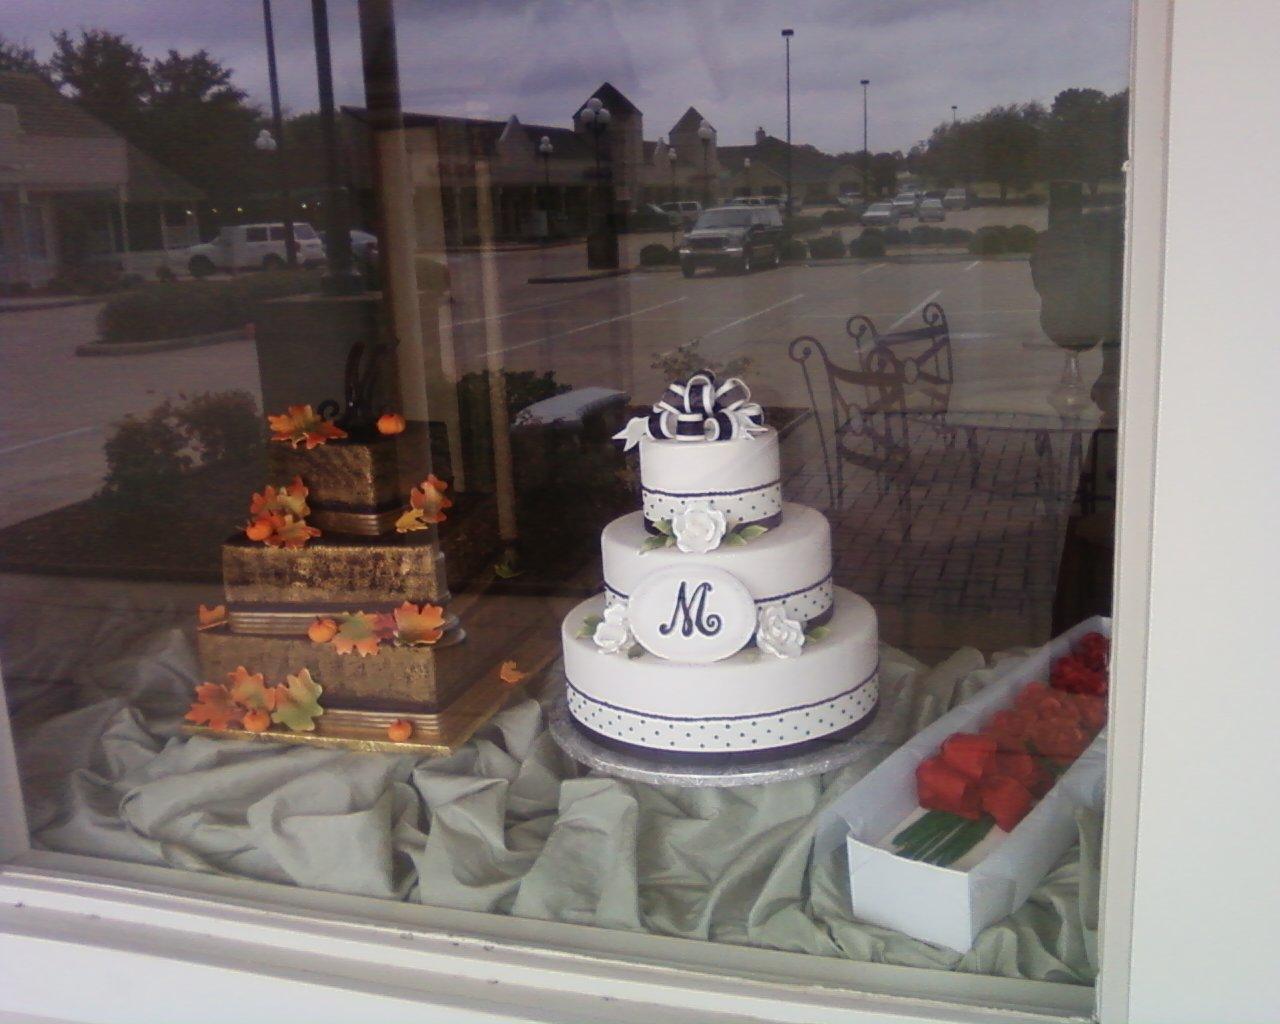 Cakes, black, cake, Fall, Monogrammed Wedding Cakes, Round, Roses, Monogram, Fondant, Buttercream, Leaves, ltd, Simply cakes